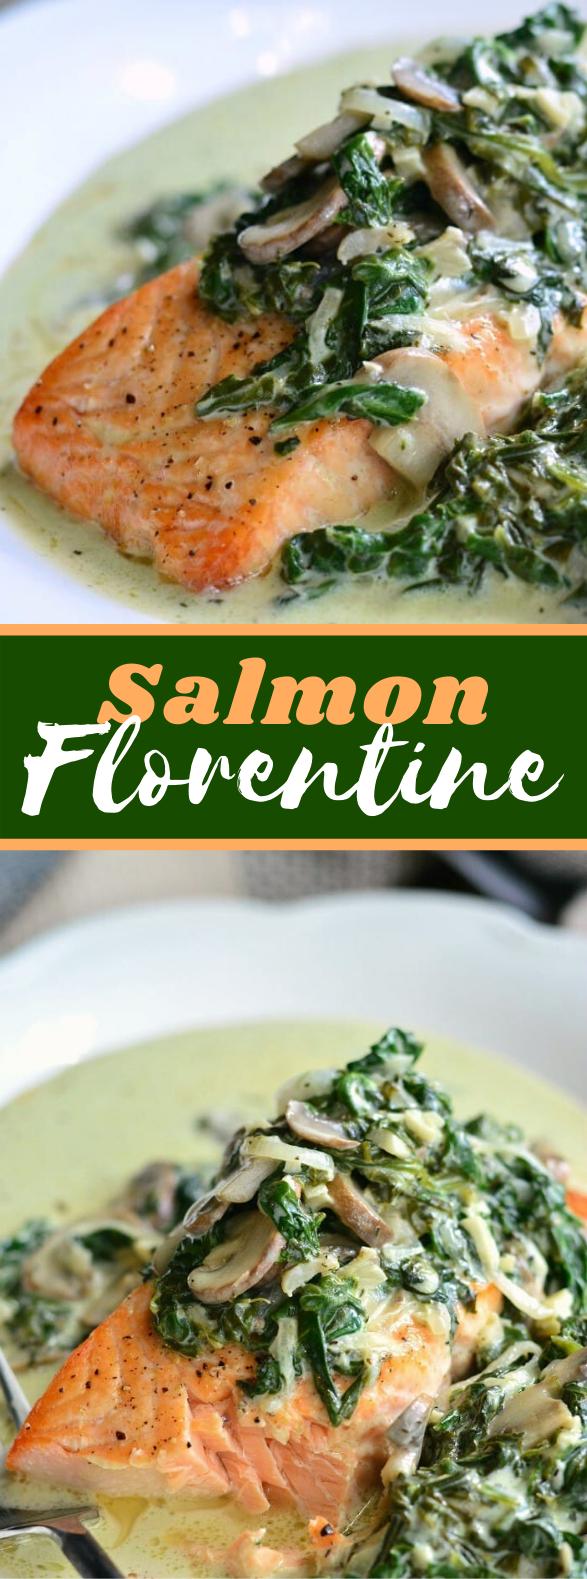 SALMON FLORENTINE #meals #dinner